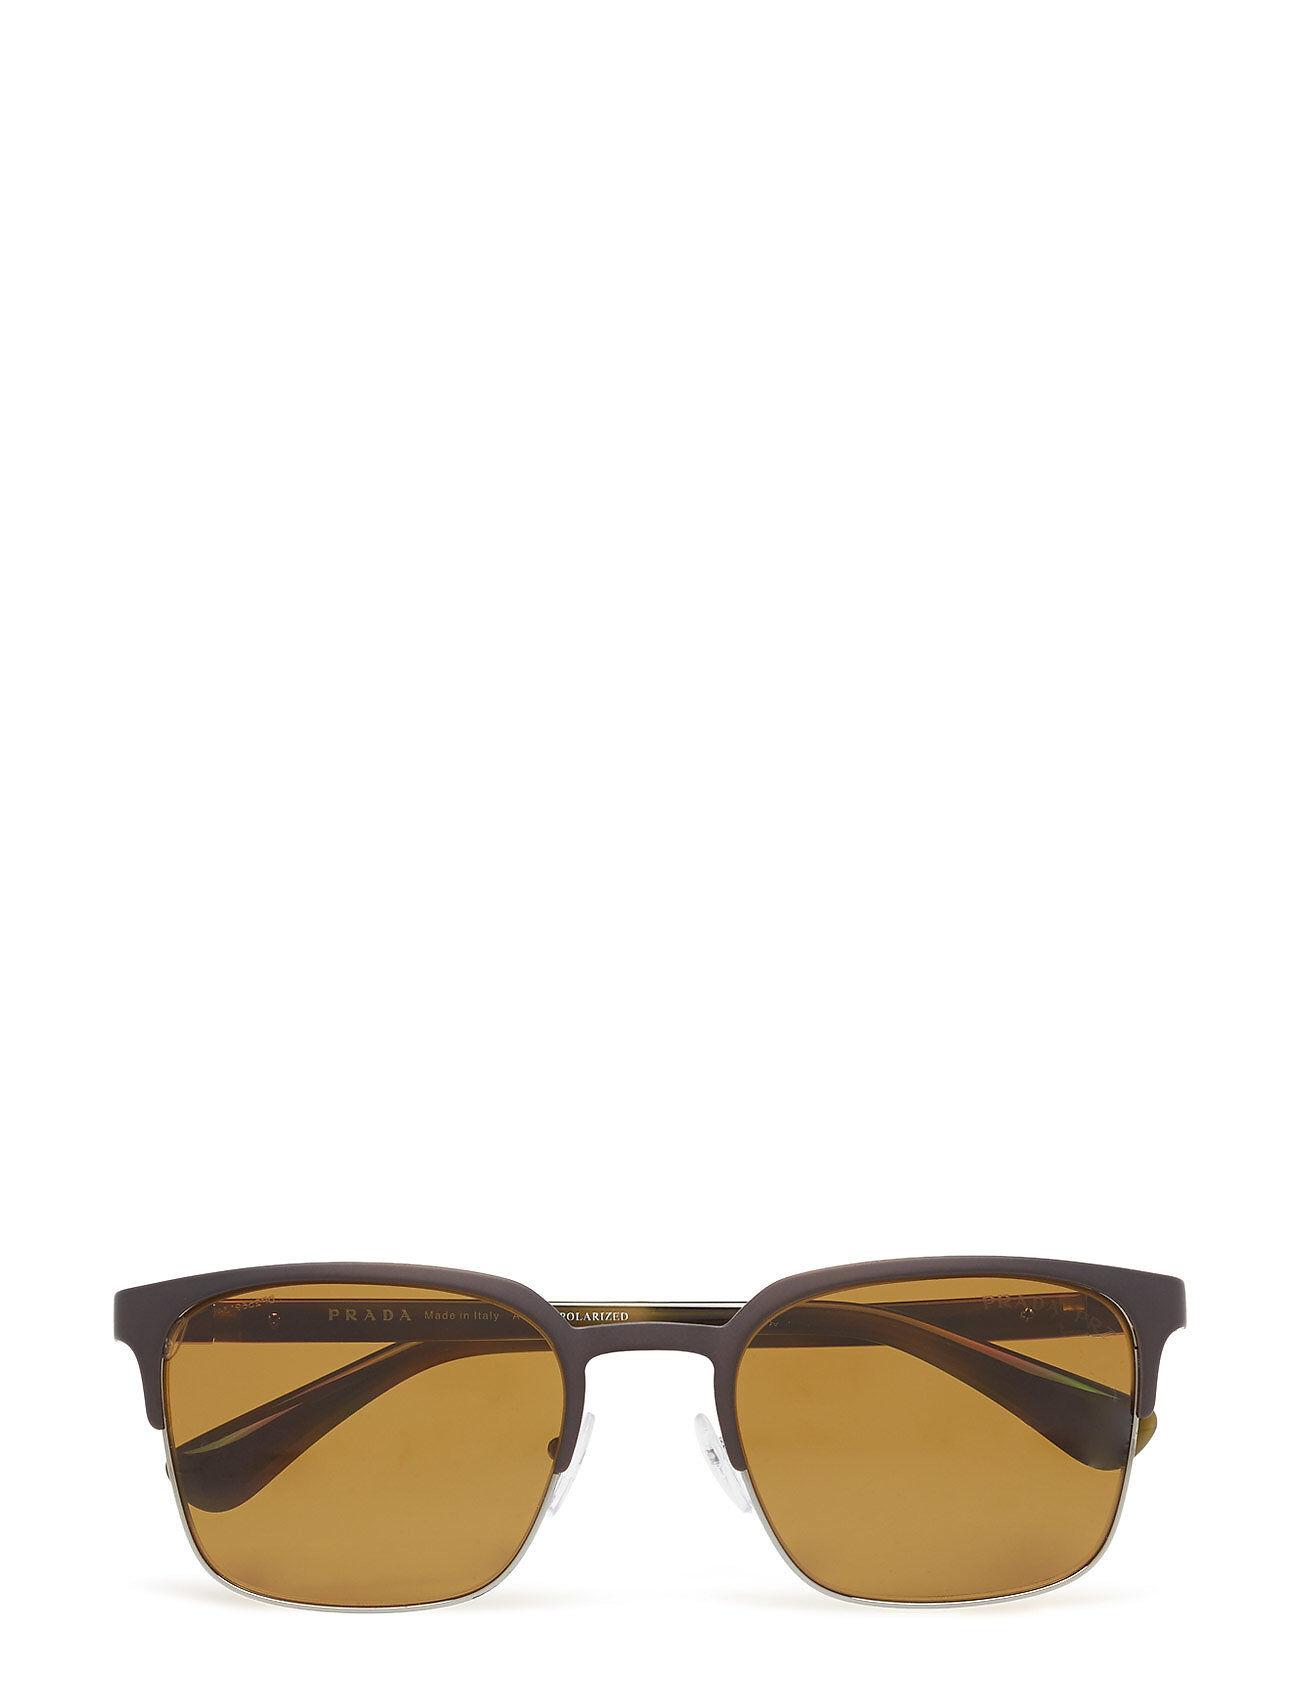 Image of Prada Sunglasses Heritage Wayfarer Aurinkolasit Ruskea Prada Sunglasses